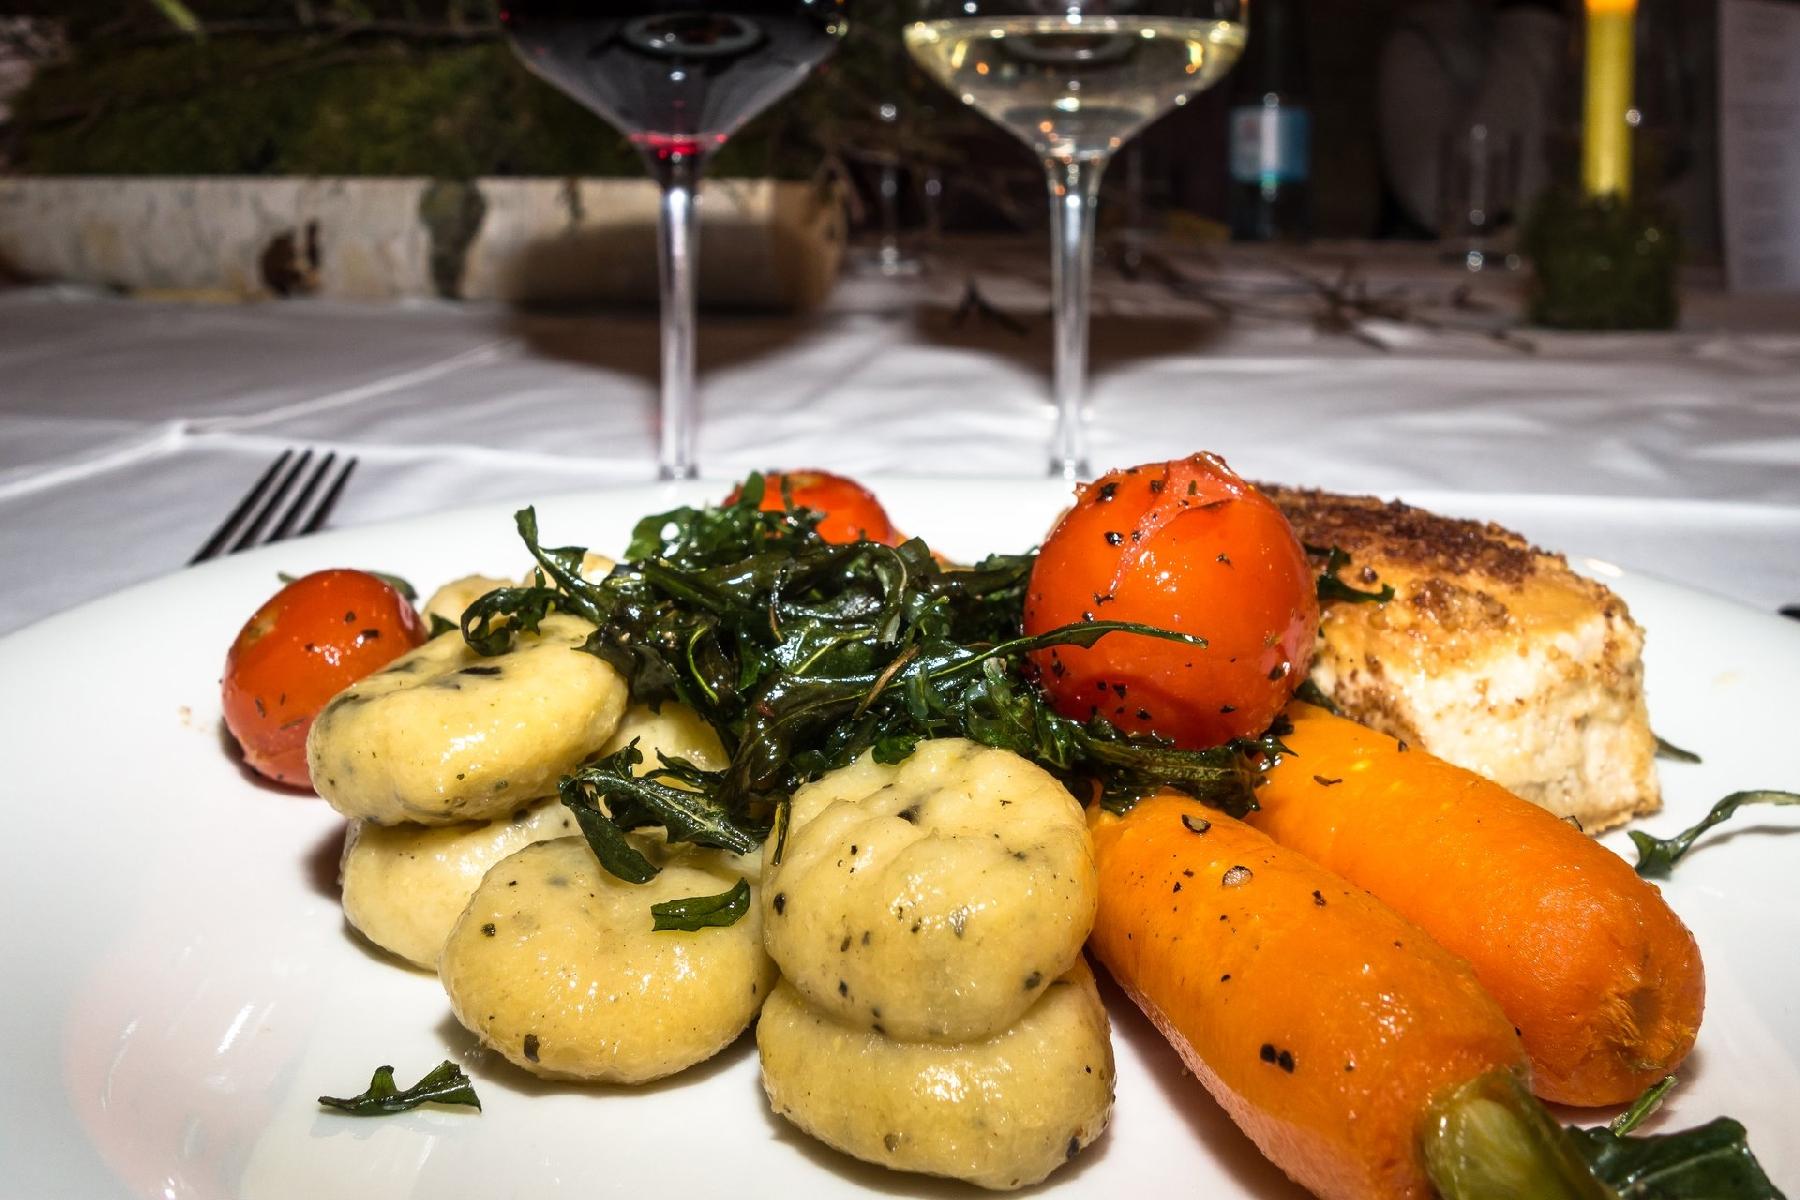 Vegetarian Spring Menu At The Rothweinhotel